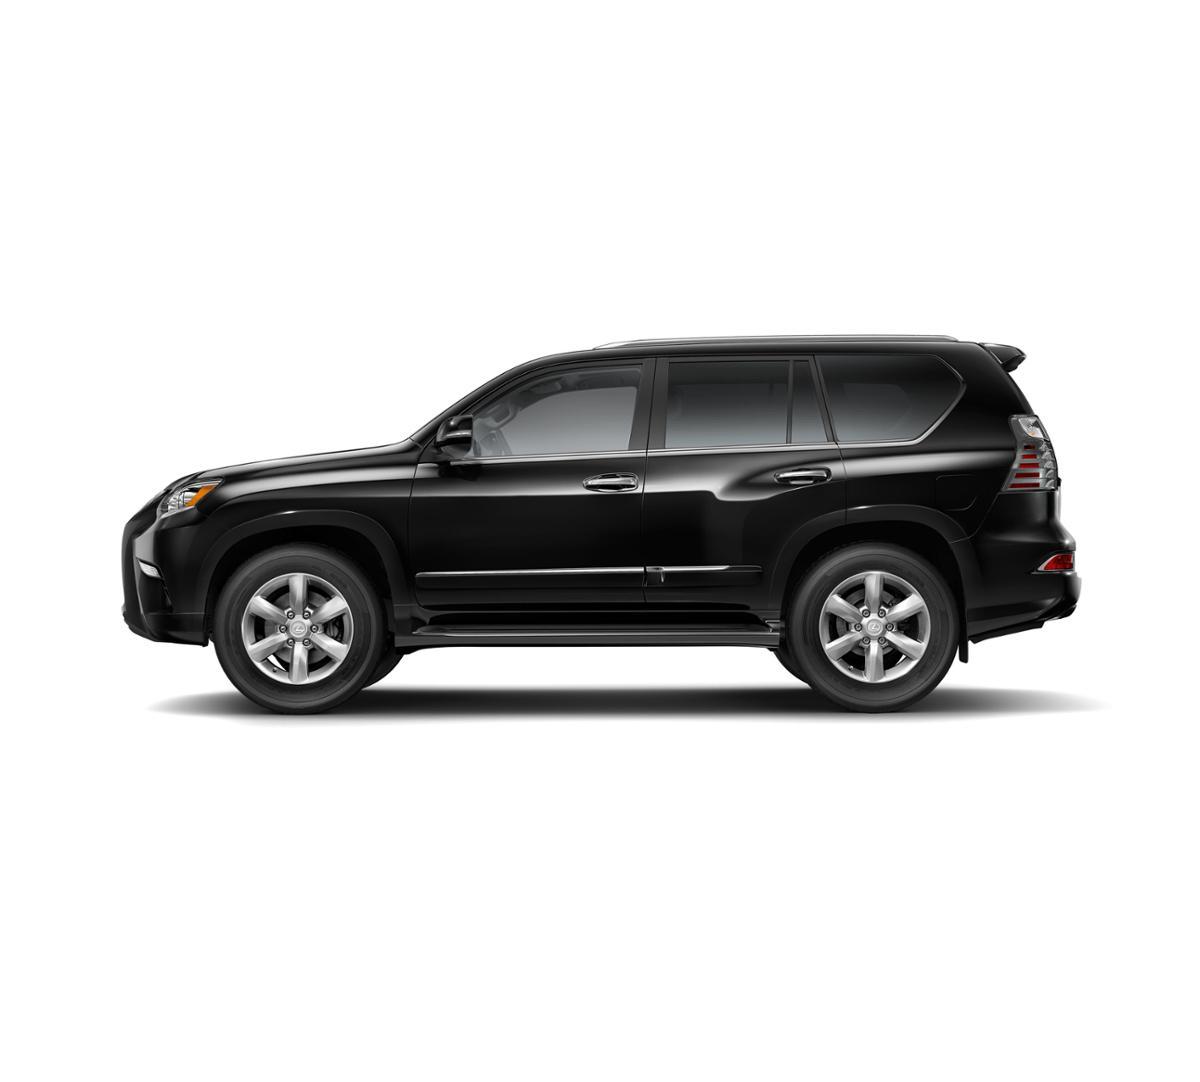 2013 Lexus 460 For Sale: Fort Worth New 2019 Lexus GX 460 Black Onyx: Suv For Sale